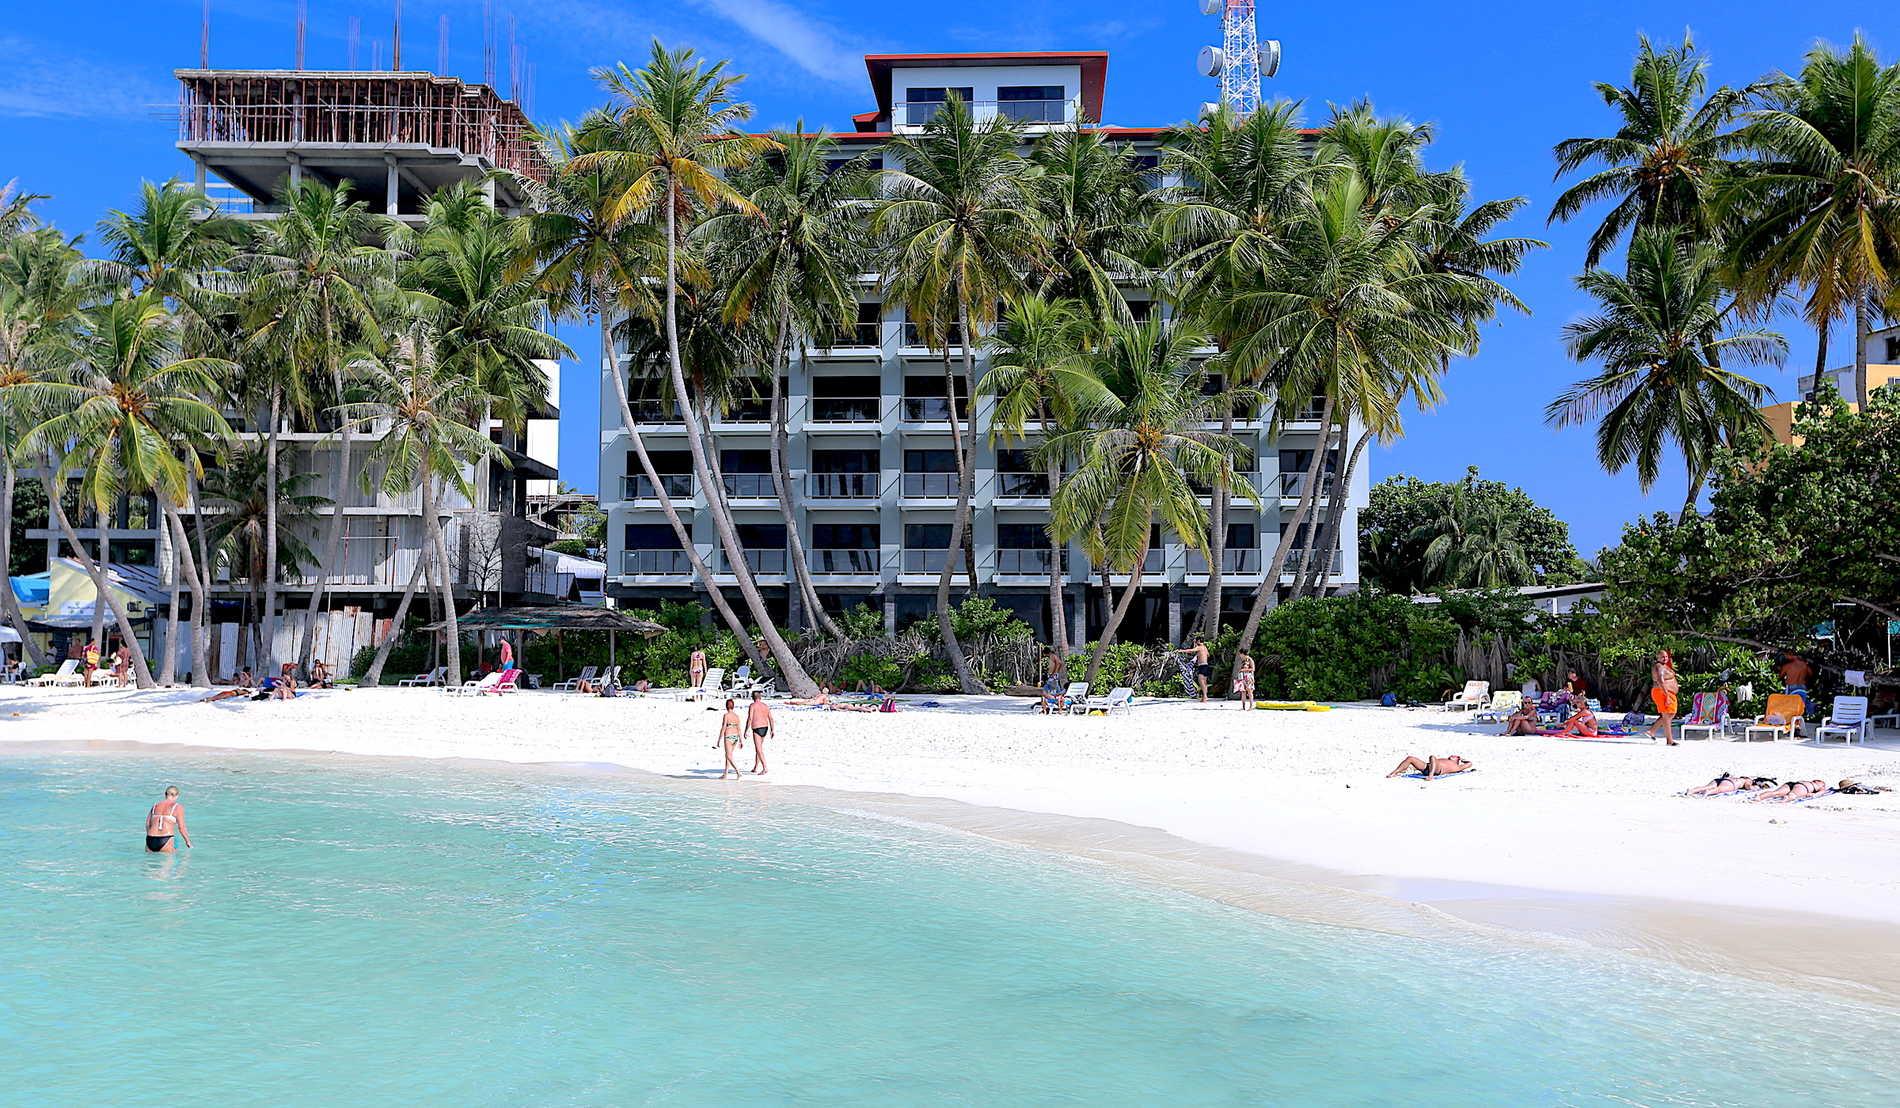 Kaani Grand Seaview Best Budget Hotel in Maldives